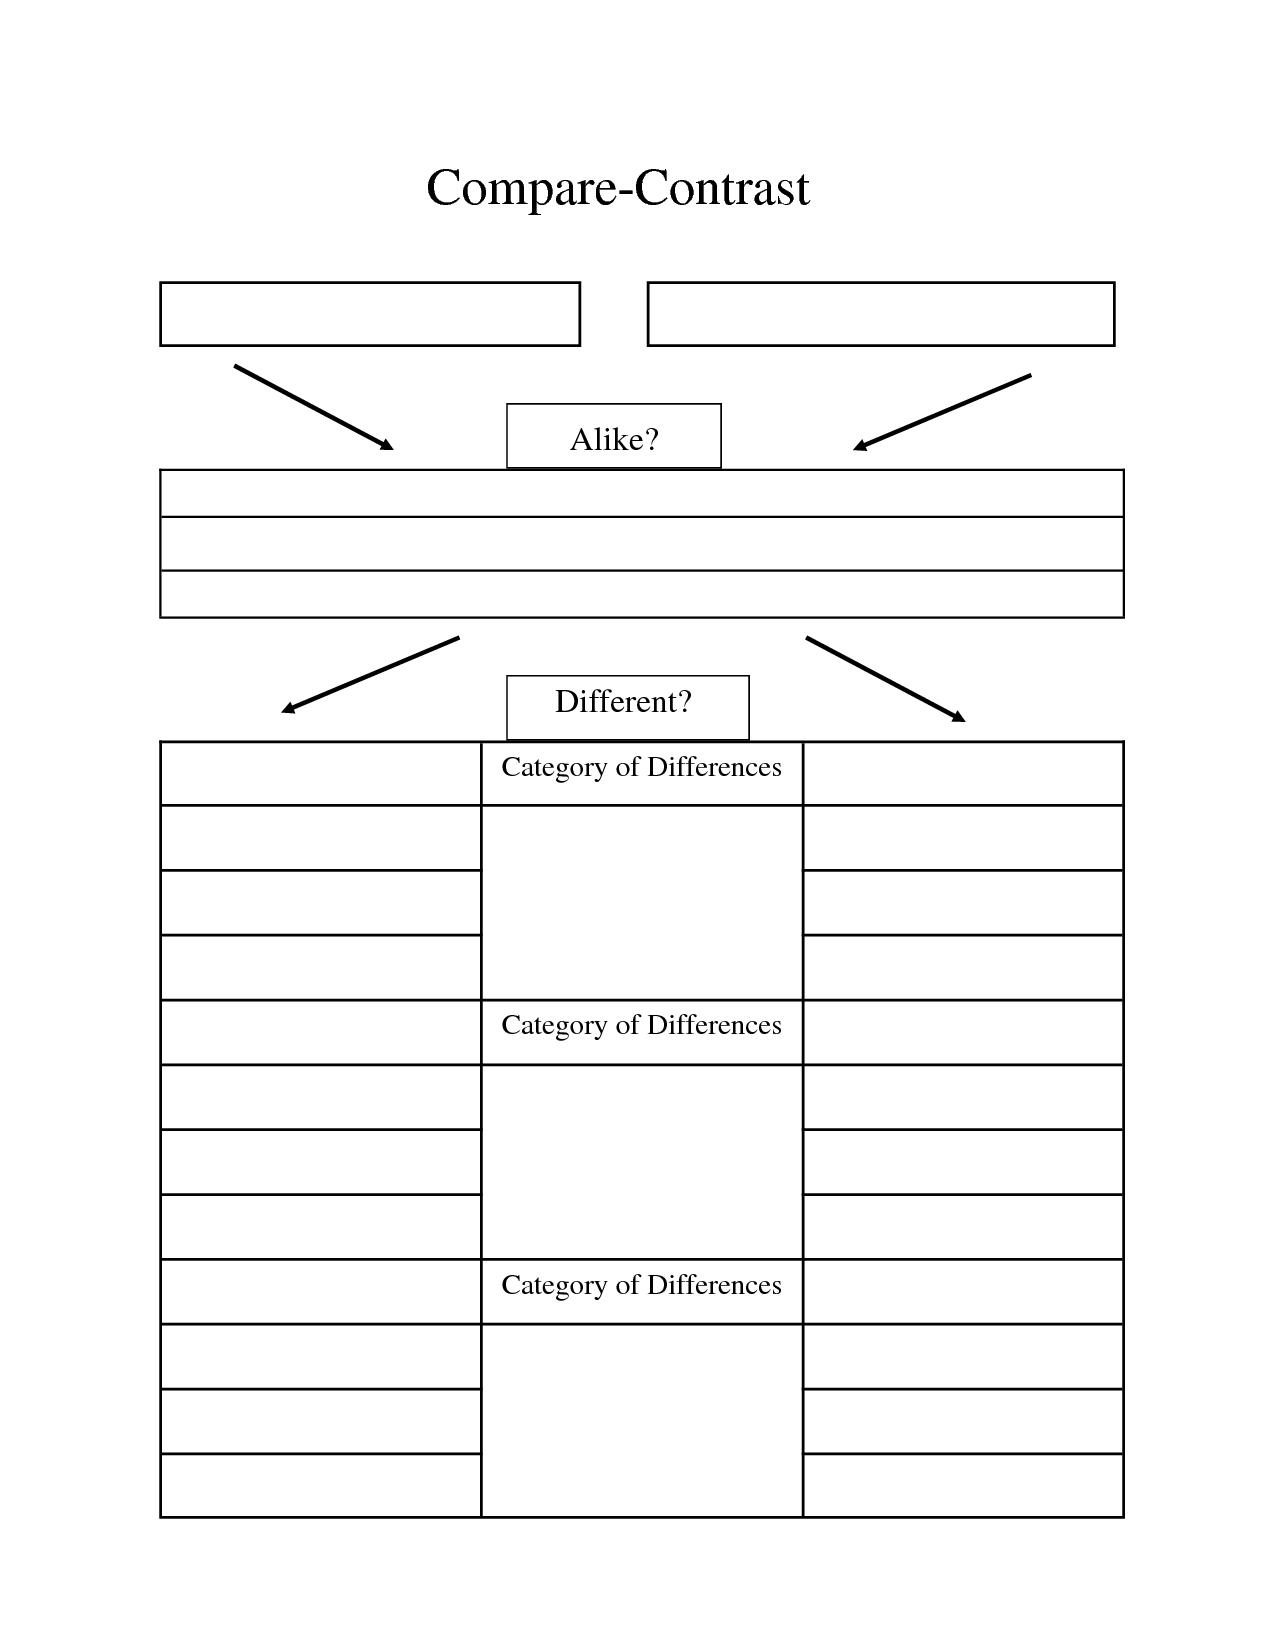 Compare Contrast Essay Graphic Organizer   Compare Contrast Alike - Free Printable Compare And Contrast Graphic Organizer